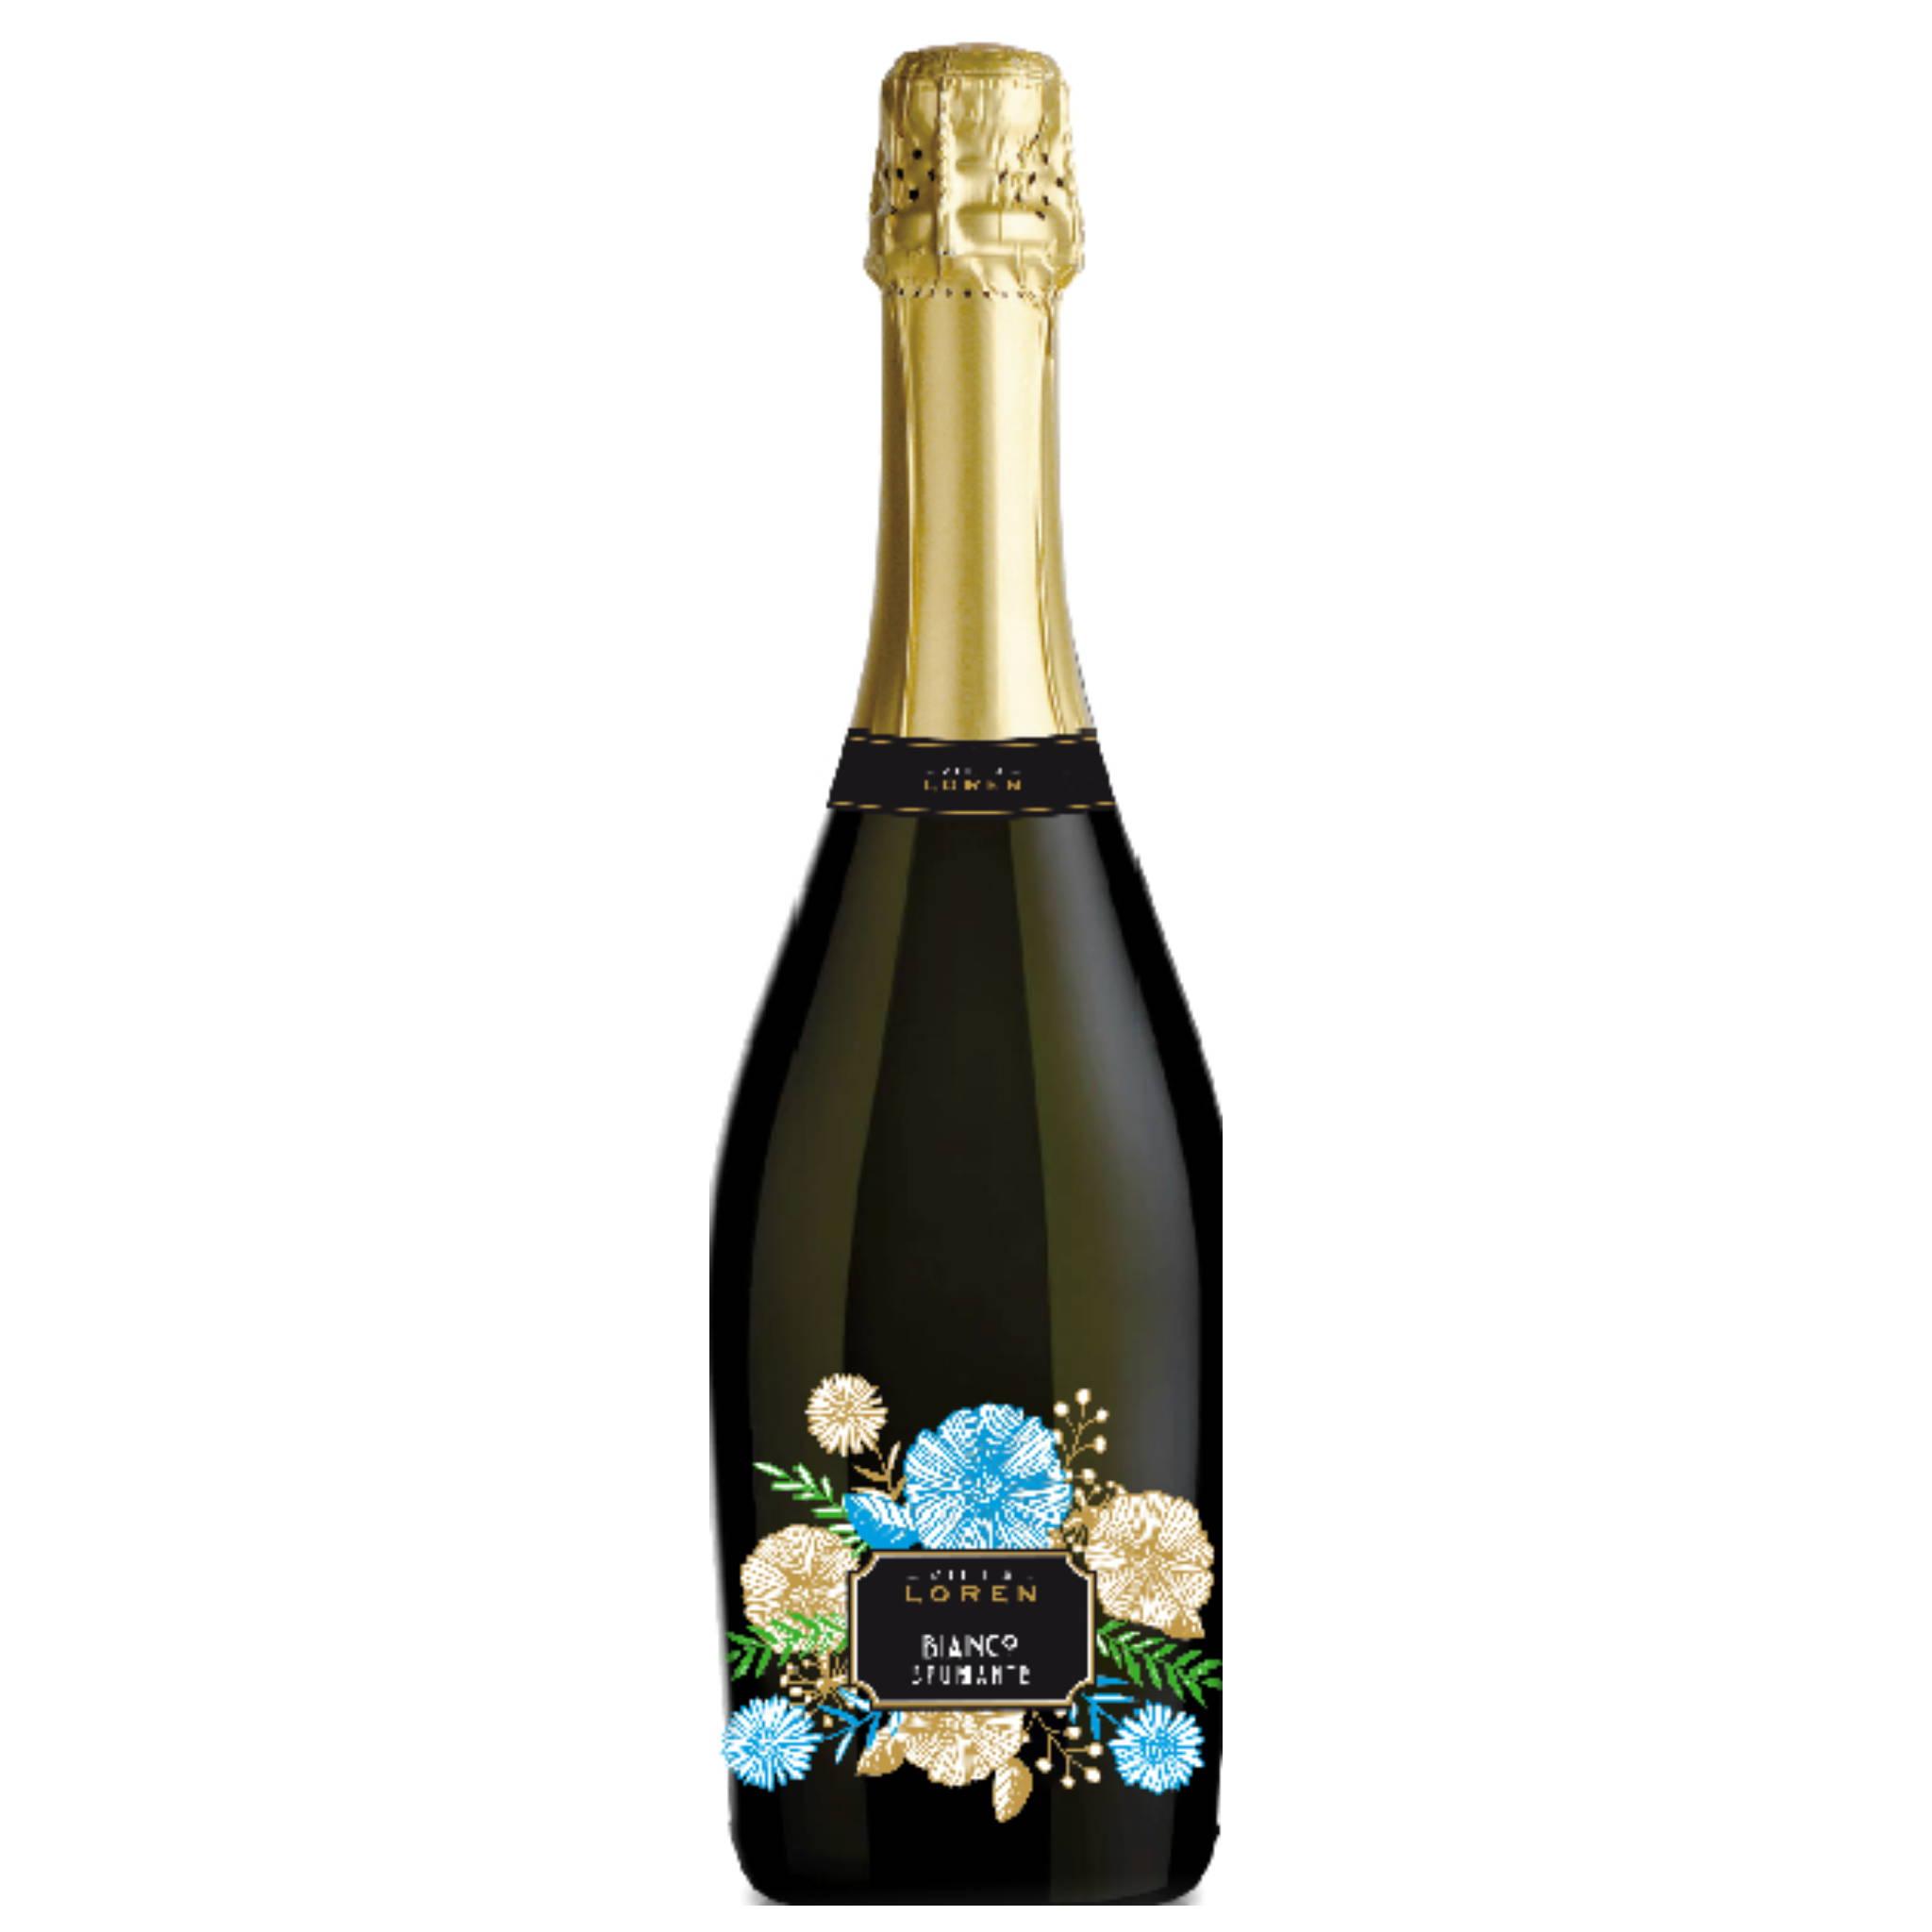 Villa Loren Bianco Spumante Italian Sparkling Wine distributed by Beviamo International in Houston TX